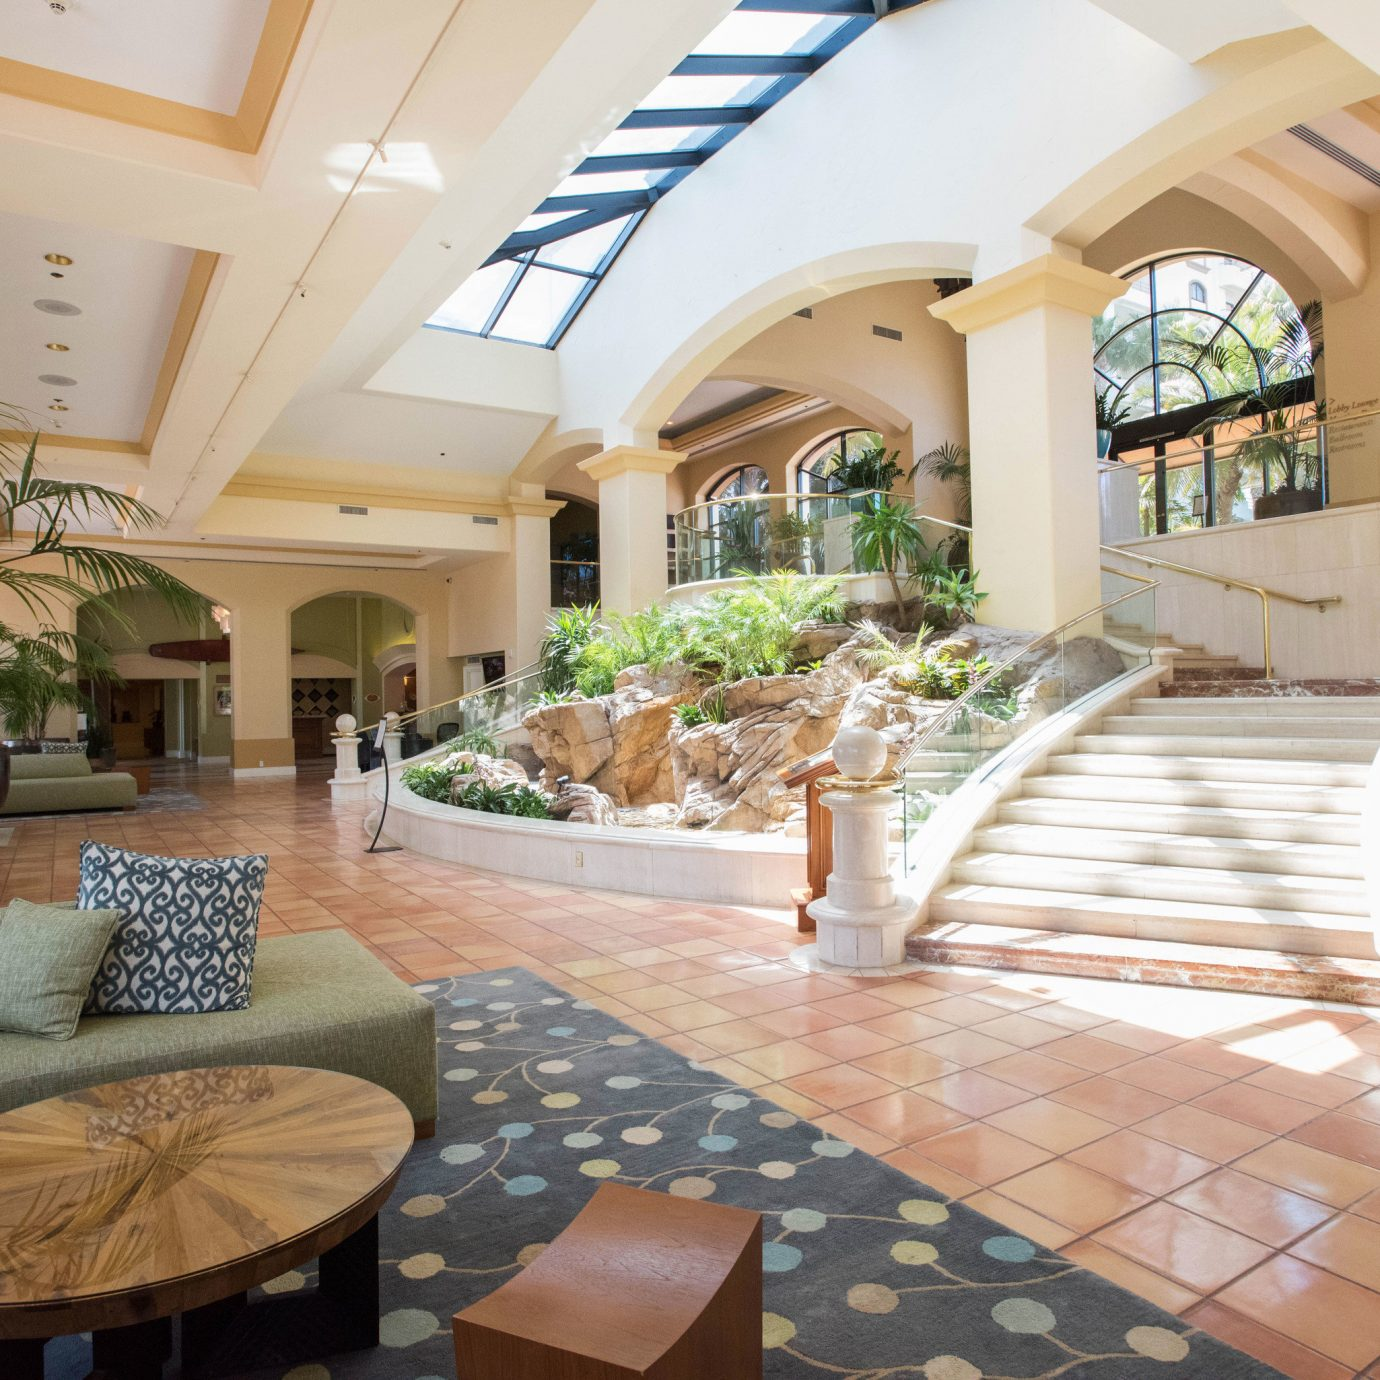 property Lobby home Resort Villa condominium Courtyard living room hacienda mansion outdoor structure cottage Dining stone